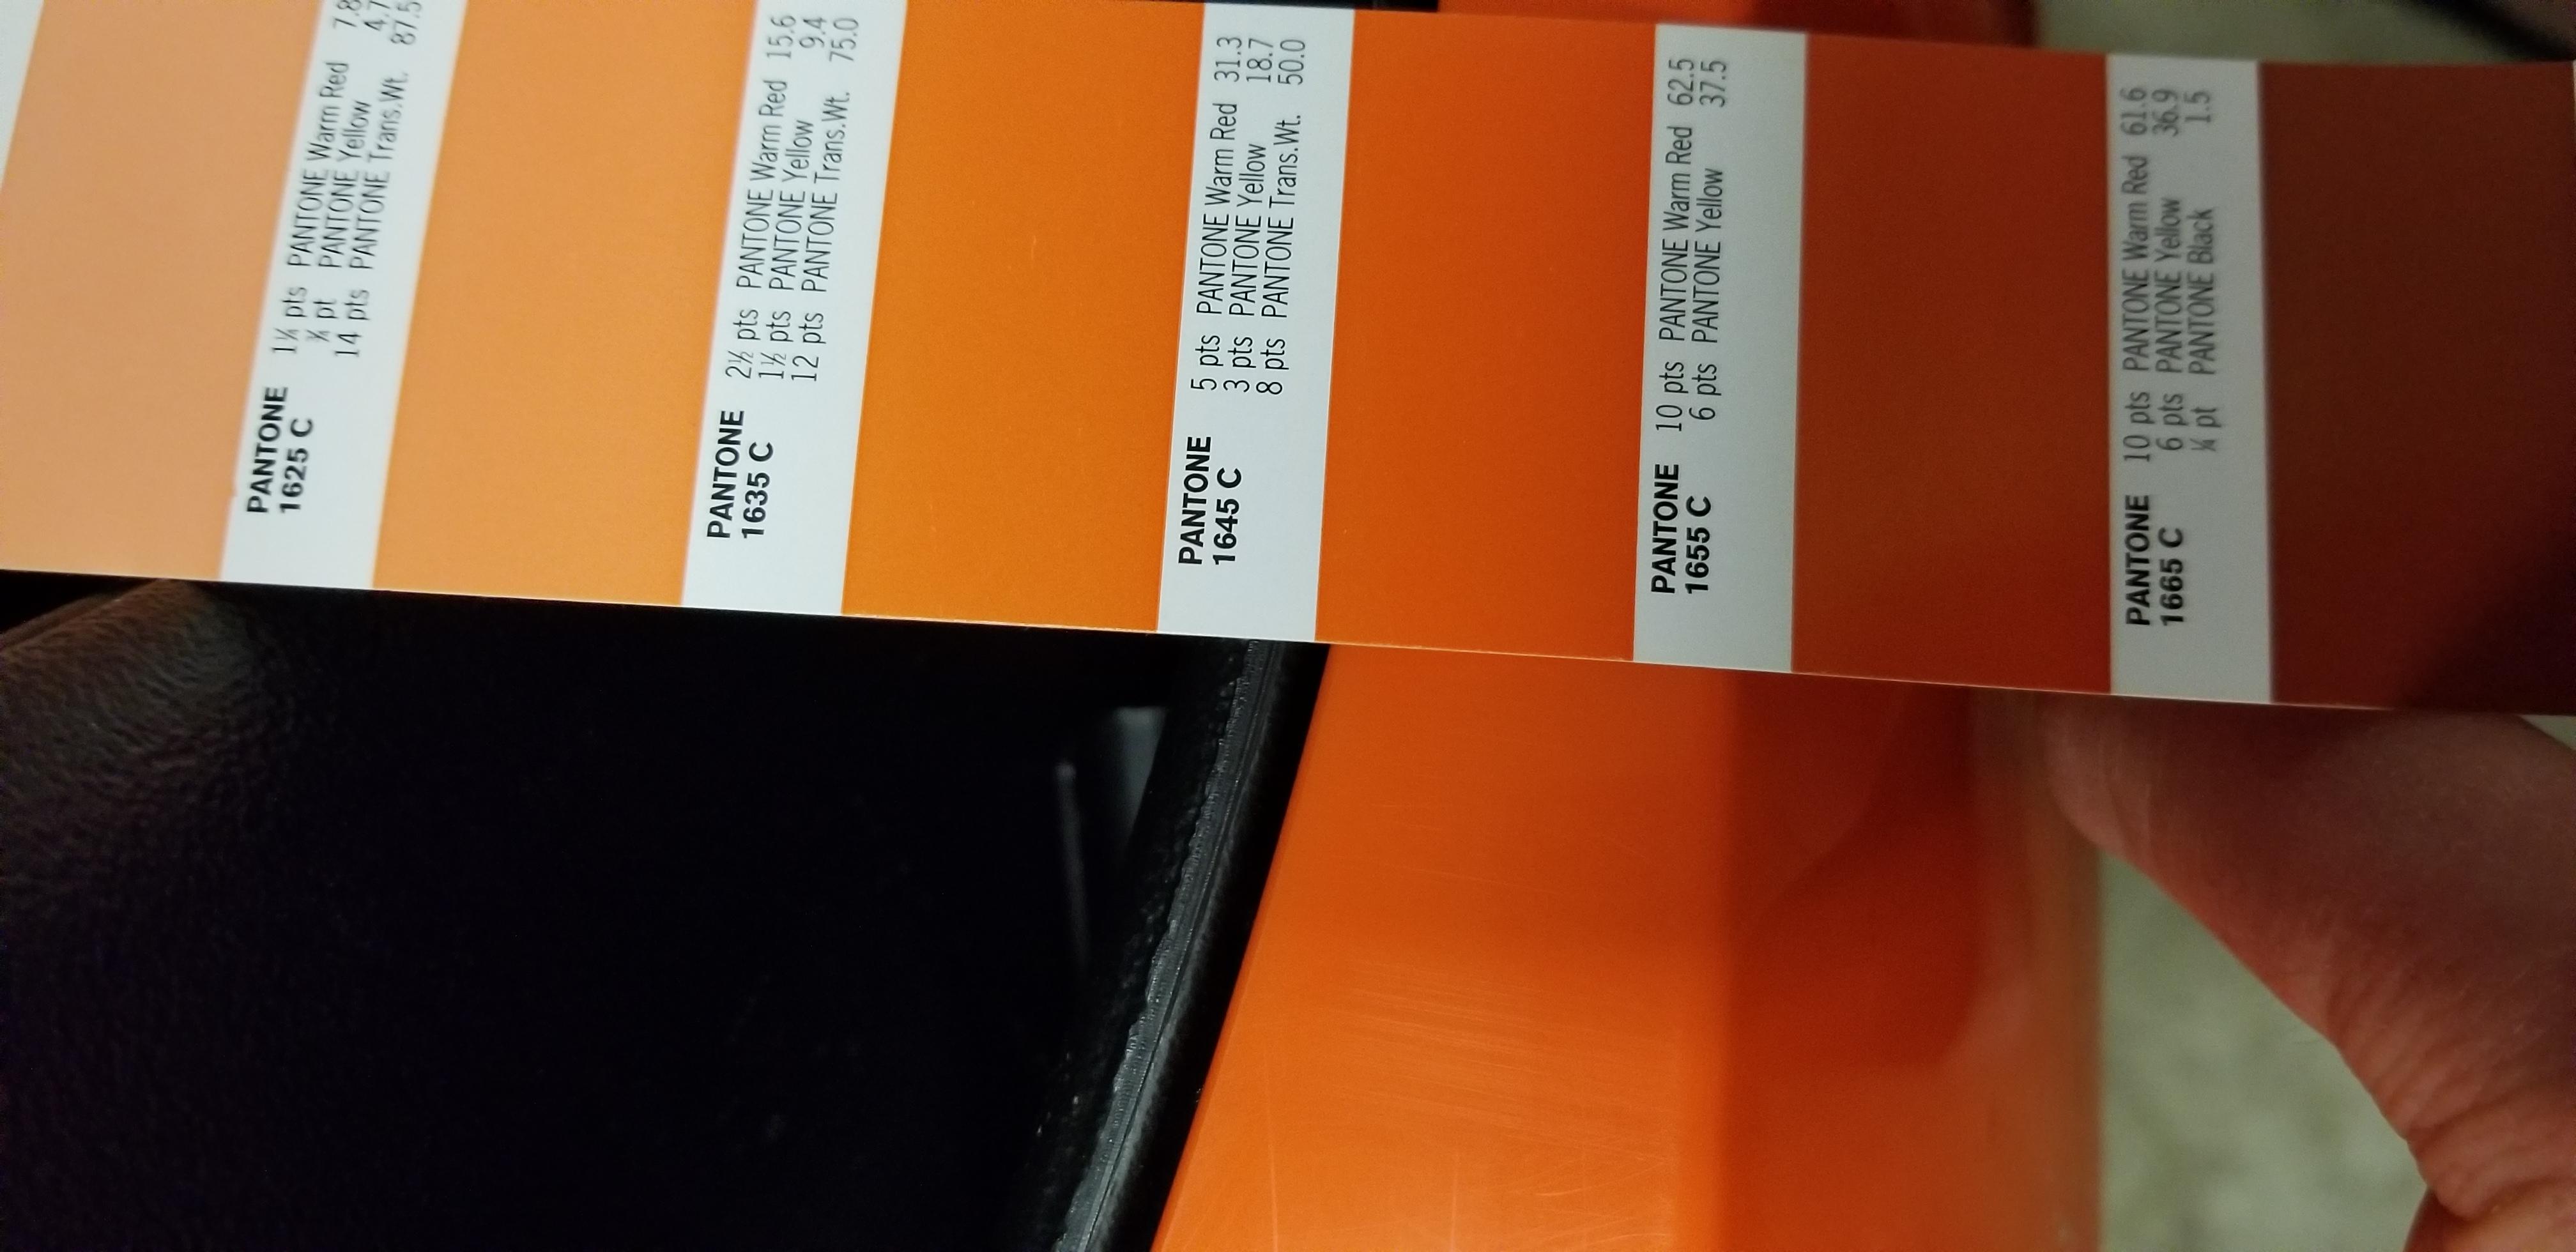 Blaze Orange Paint Color Code 20180320 212734 1521596198586 Jpg